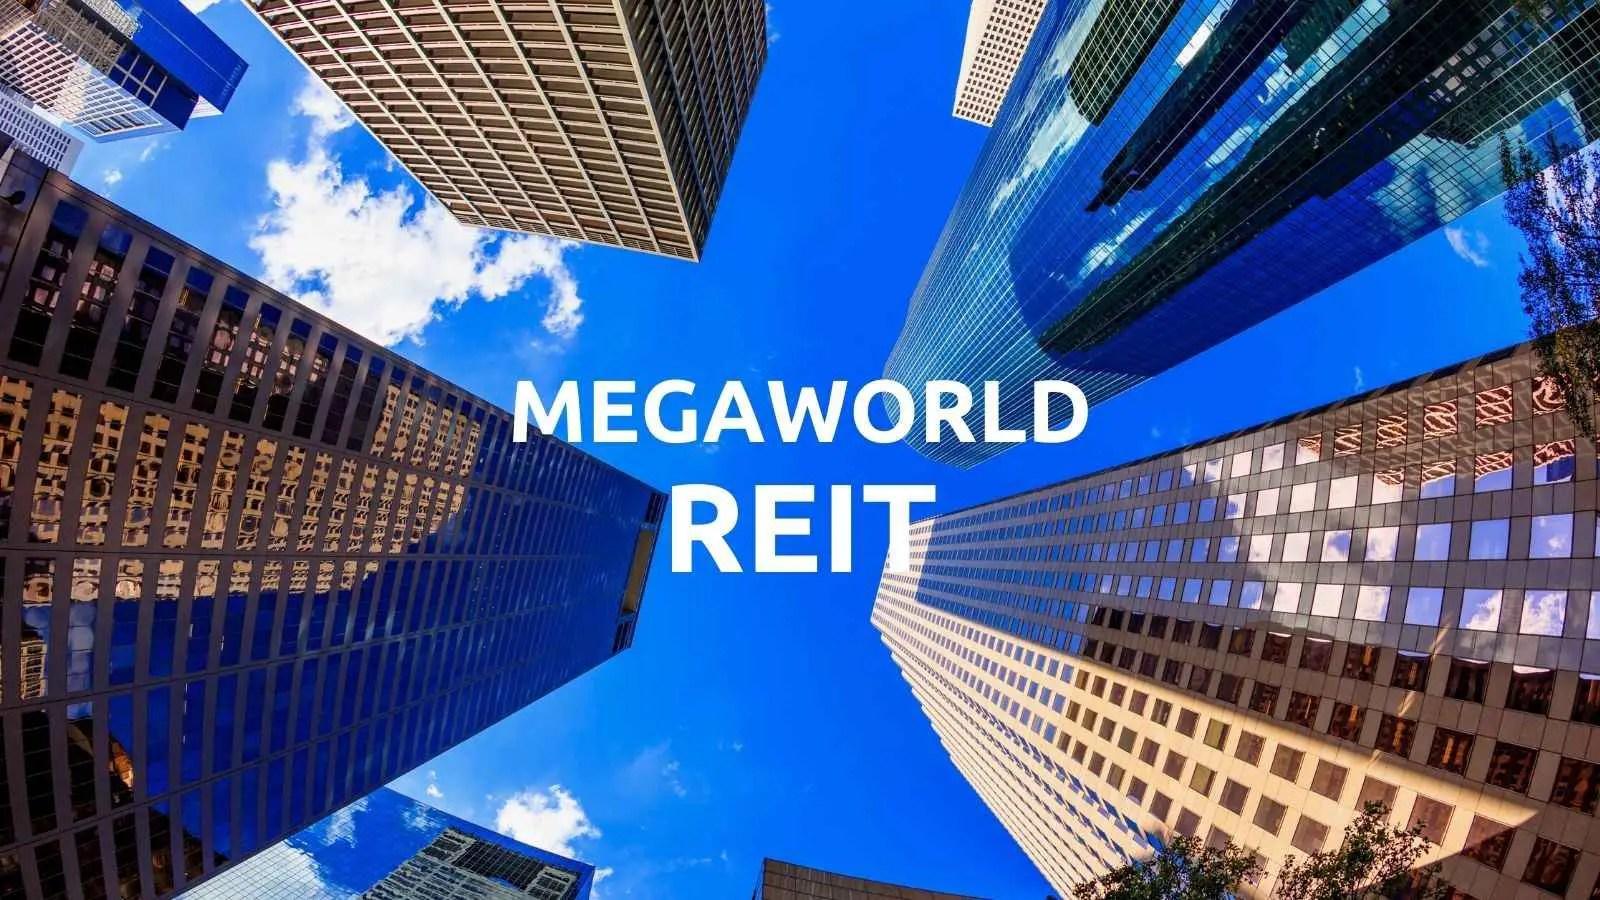 benefits of investing megaworld reit